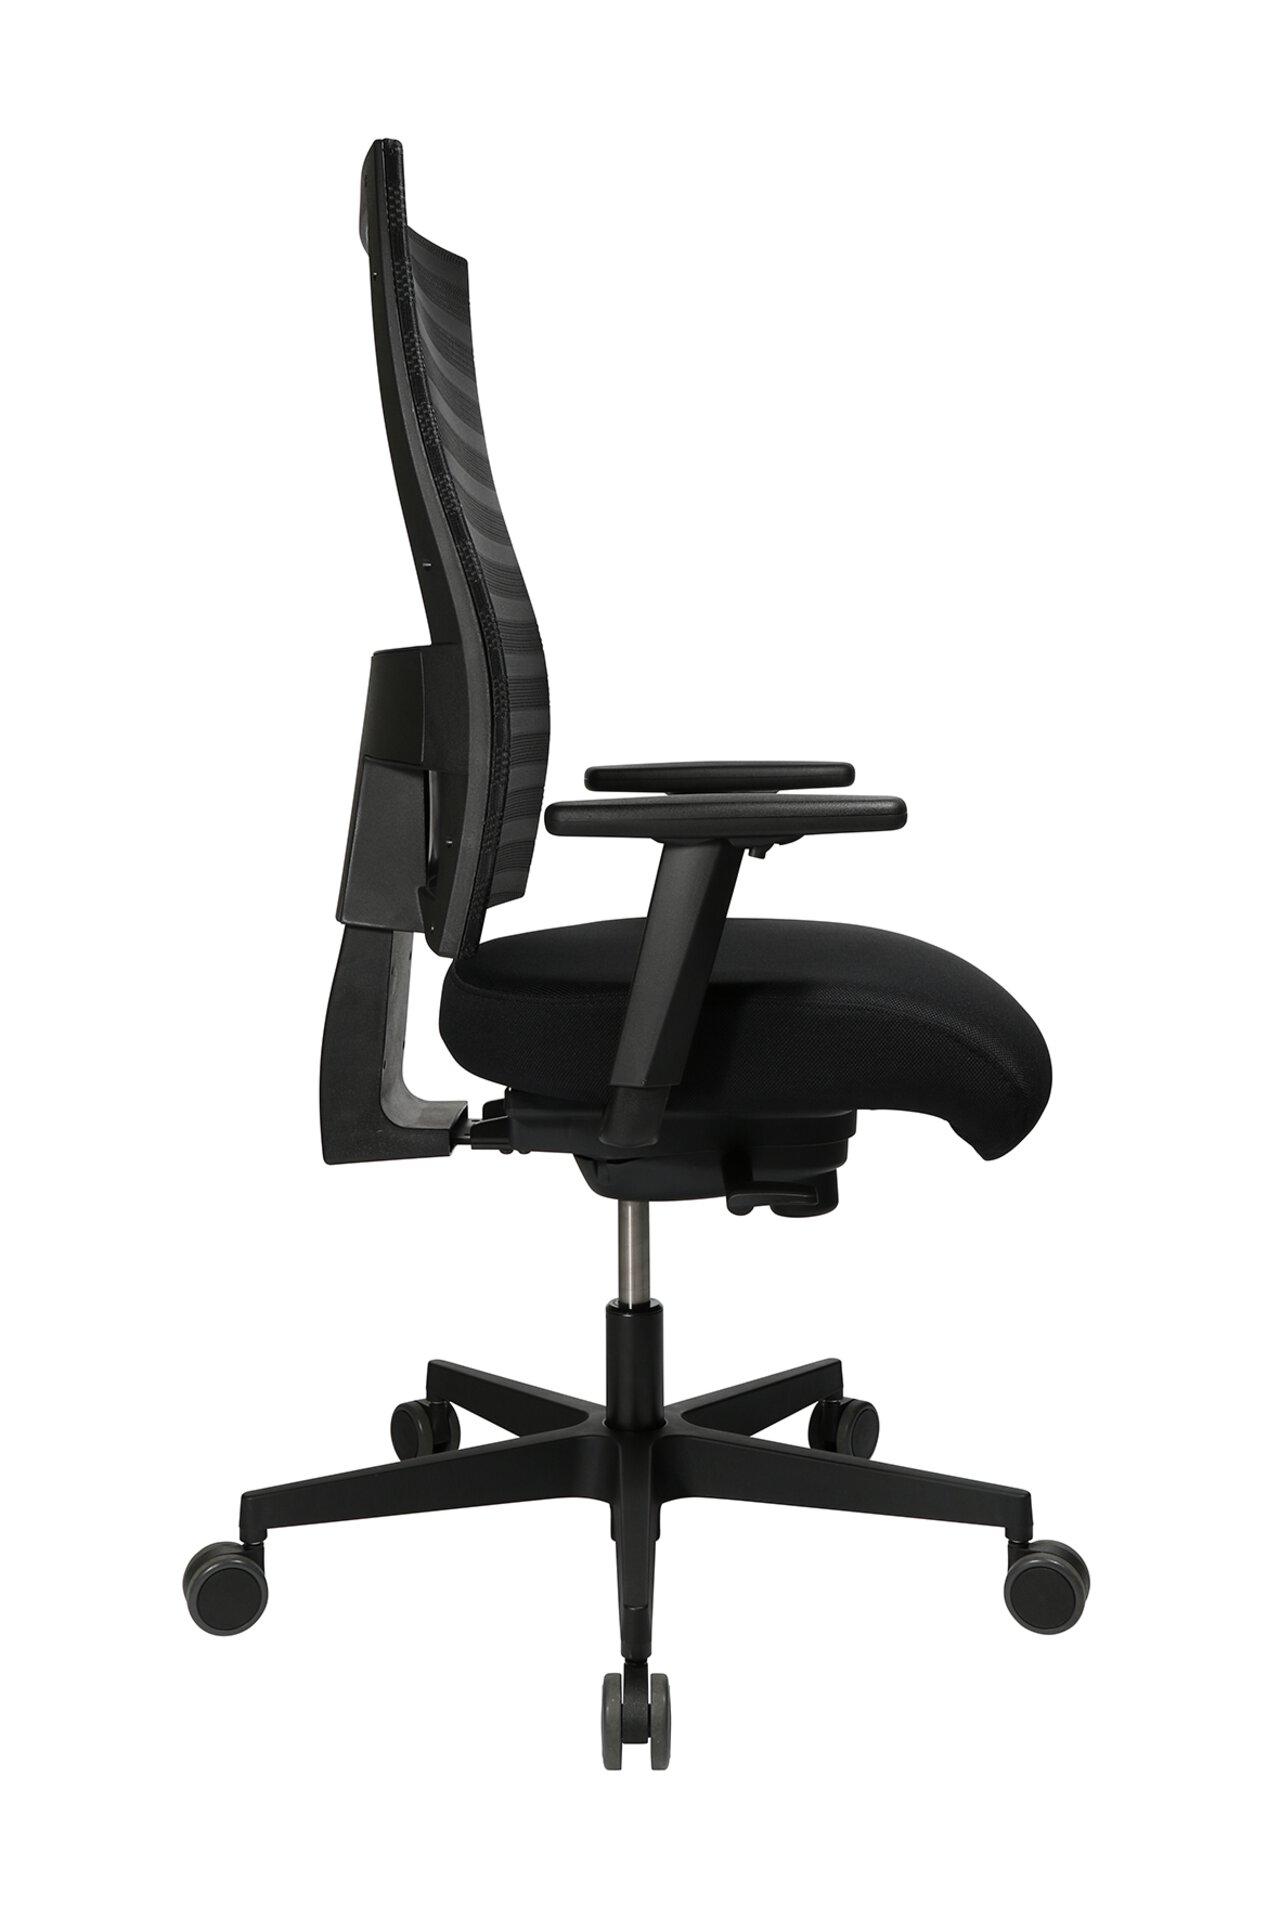 Büro-Drehstuhl M2 MONDO Textil schwarz 57 x 120 x 59 cm